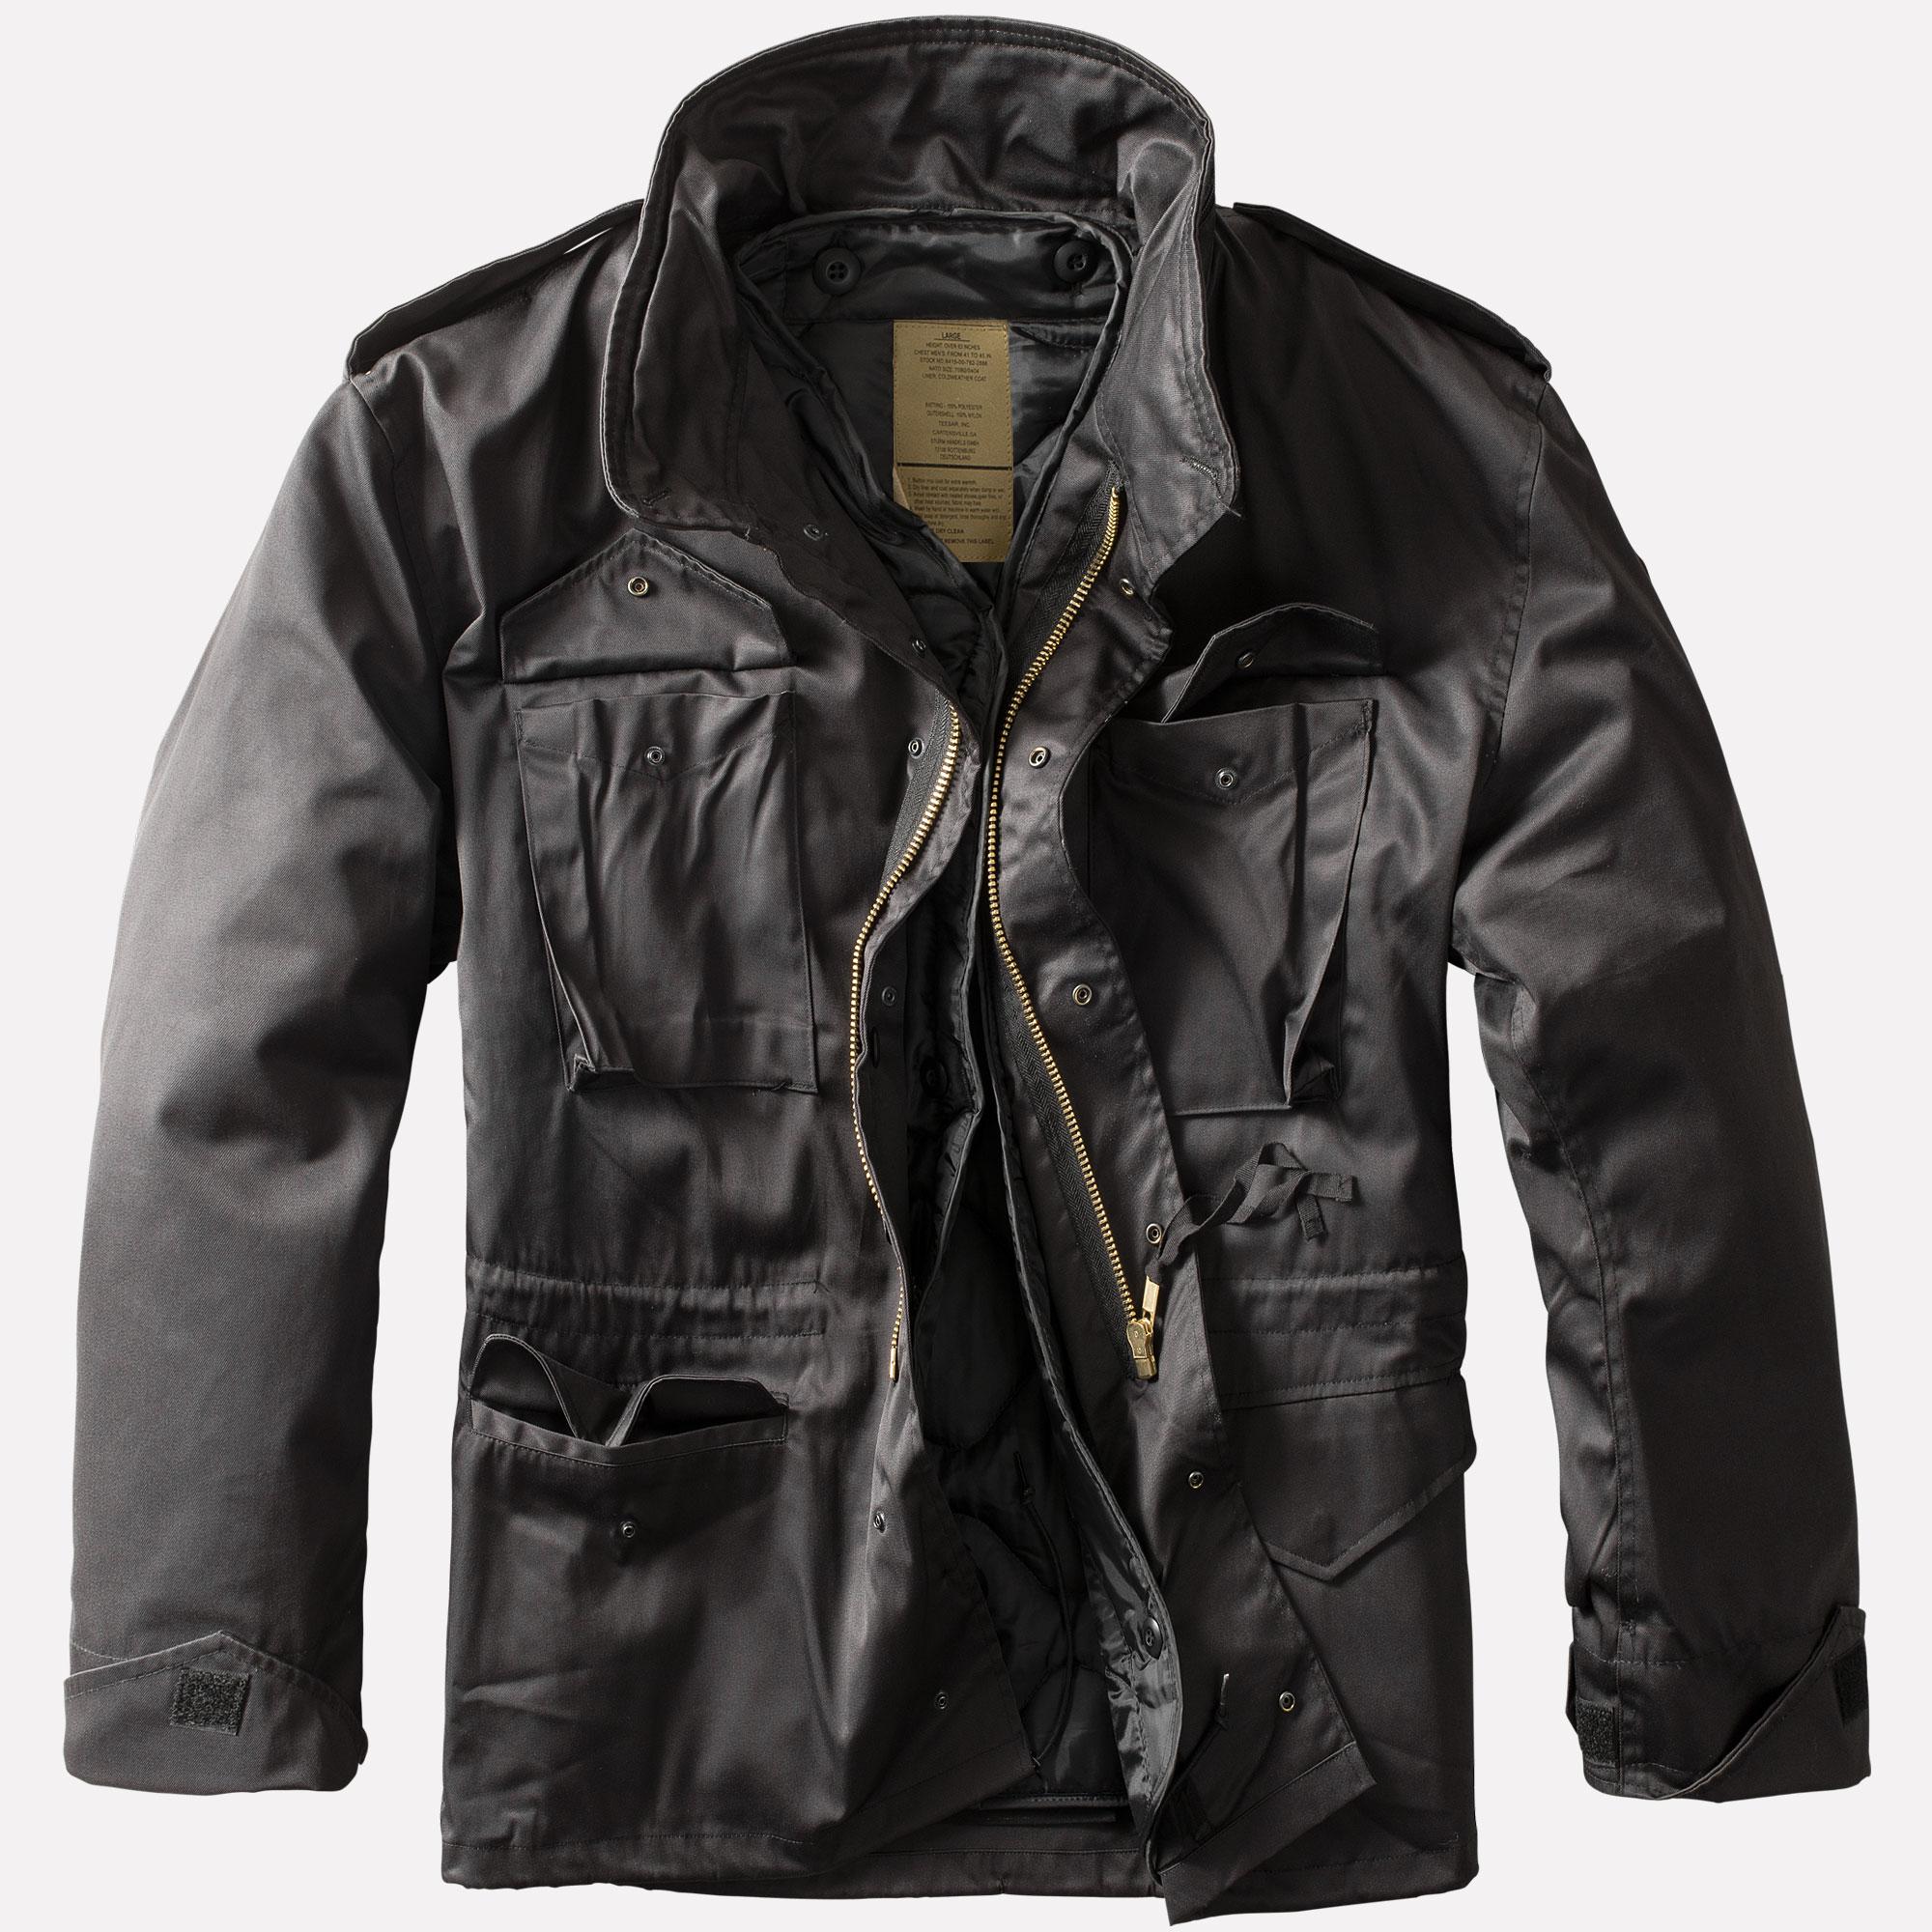 0703c9f7628fe Urbandreamz M65 Field Jacket Bundeswehr Us Army Winter Parka Camo   eBay